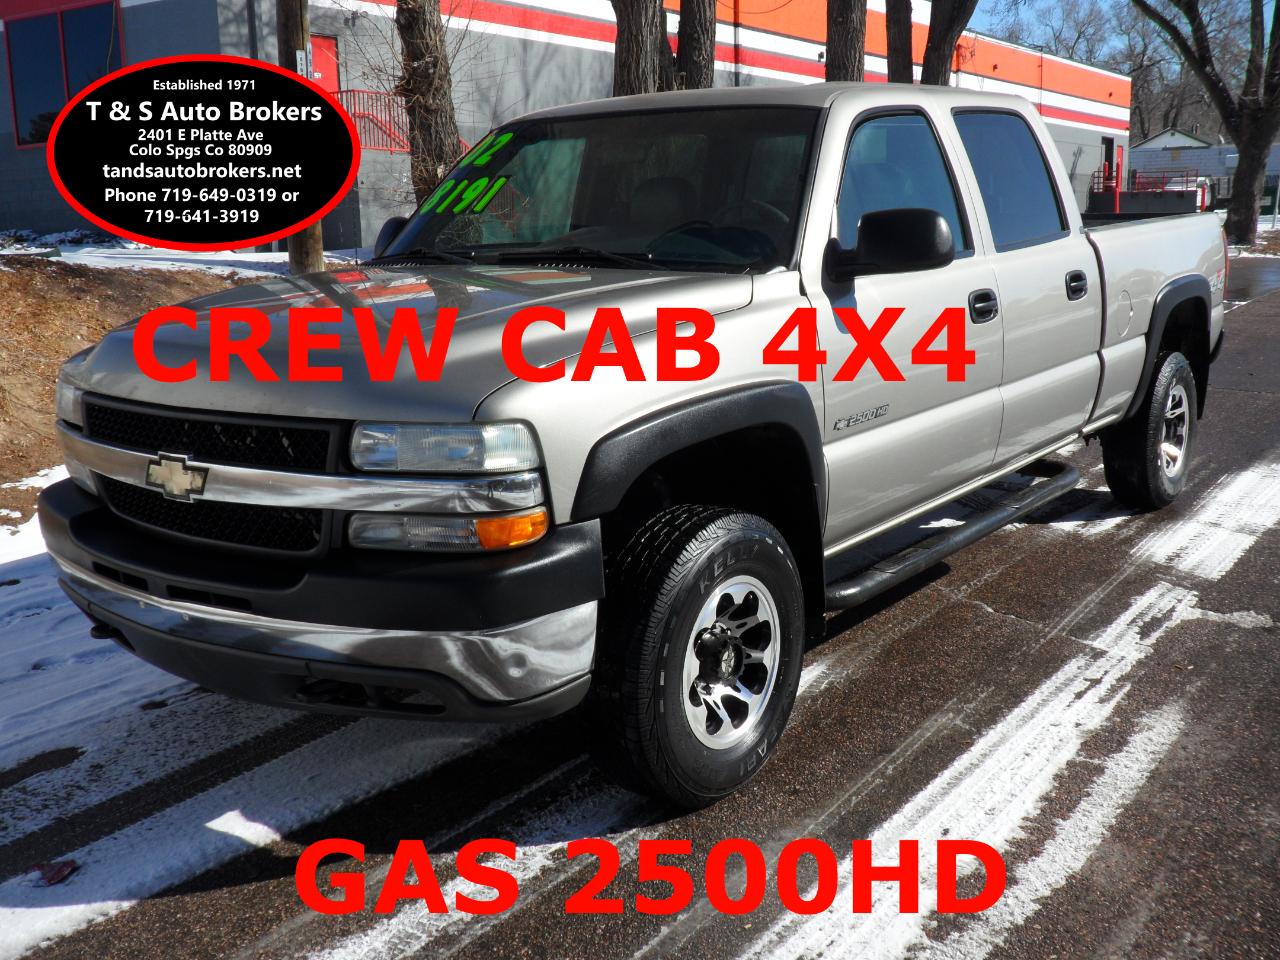 2002 Chevrolet Silverado 2500HD 6.0L V8 GAS CREW CAB 4X4